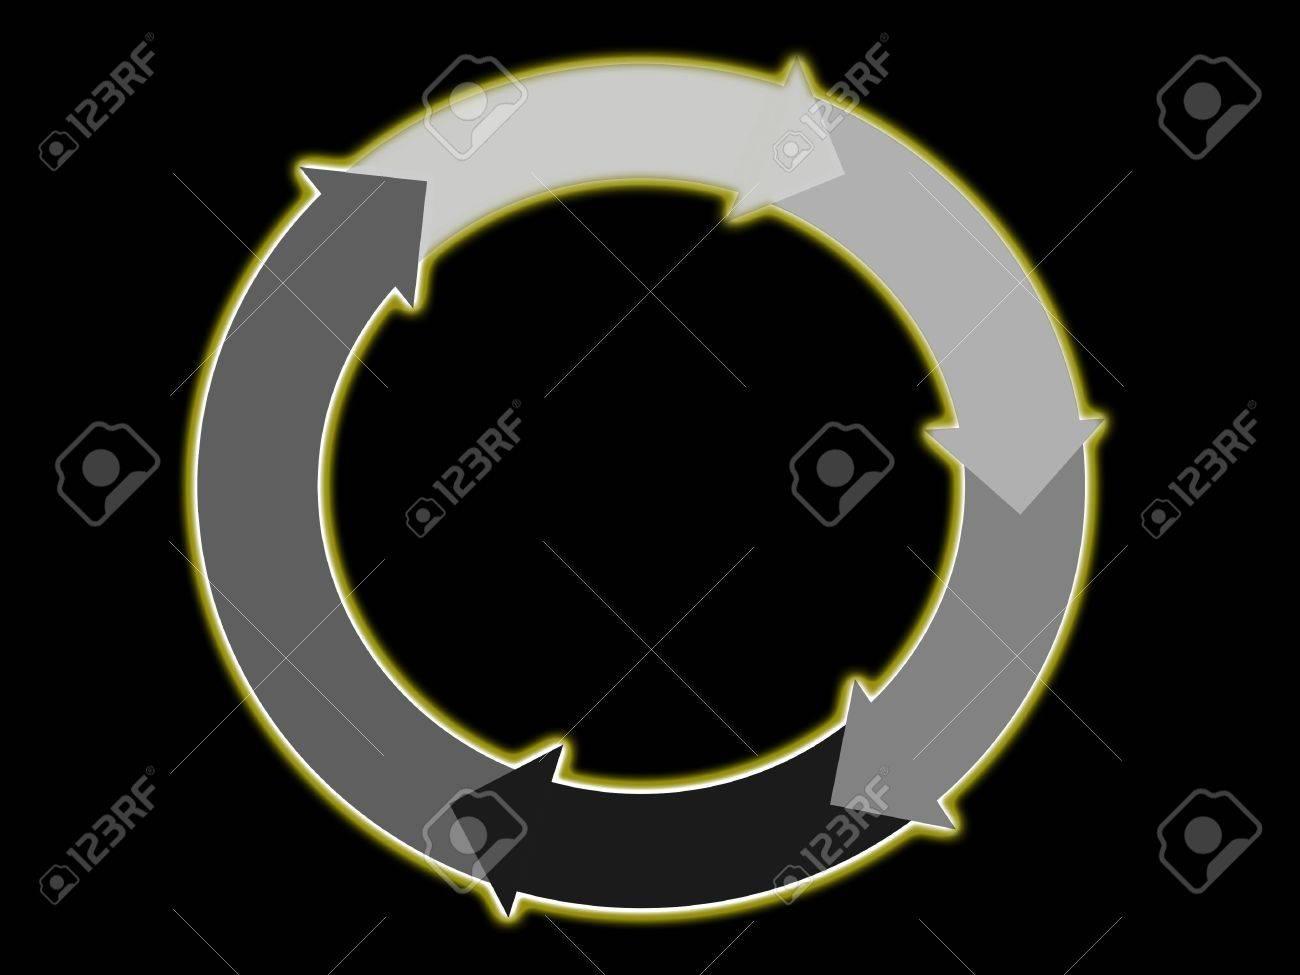 Business sober circulatory system representation Stock Photo - 13838344